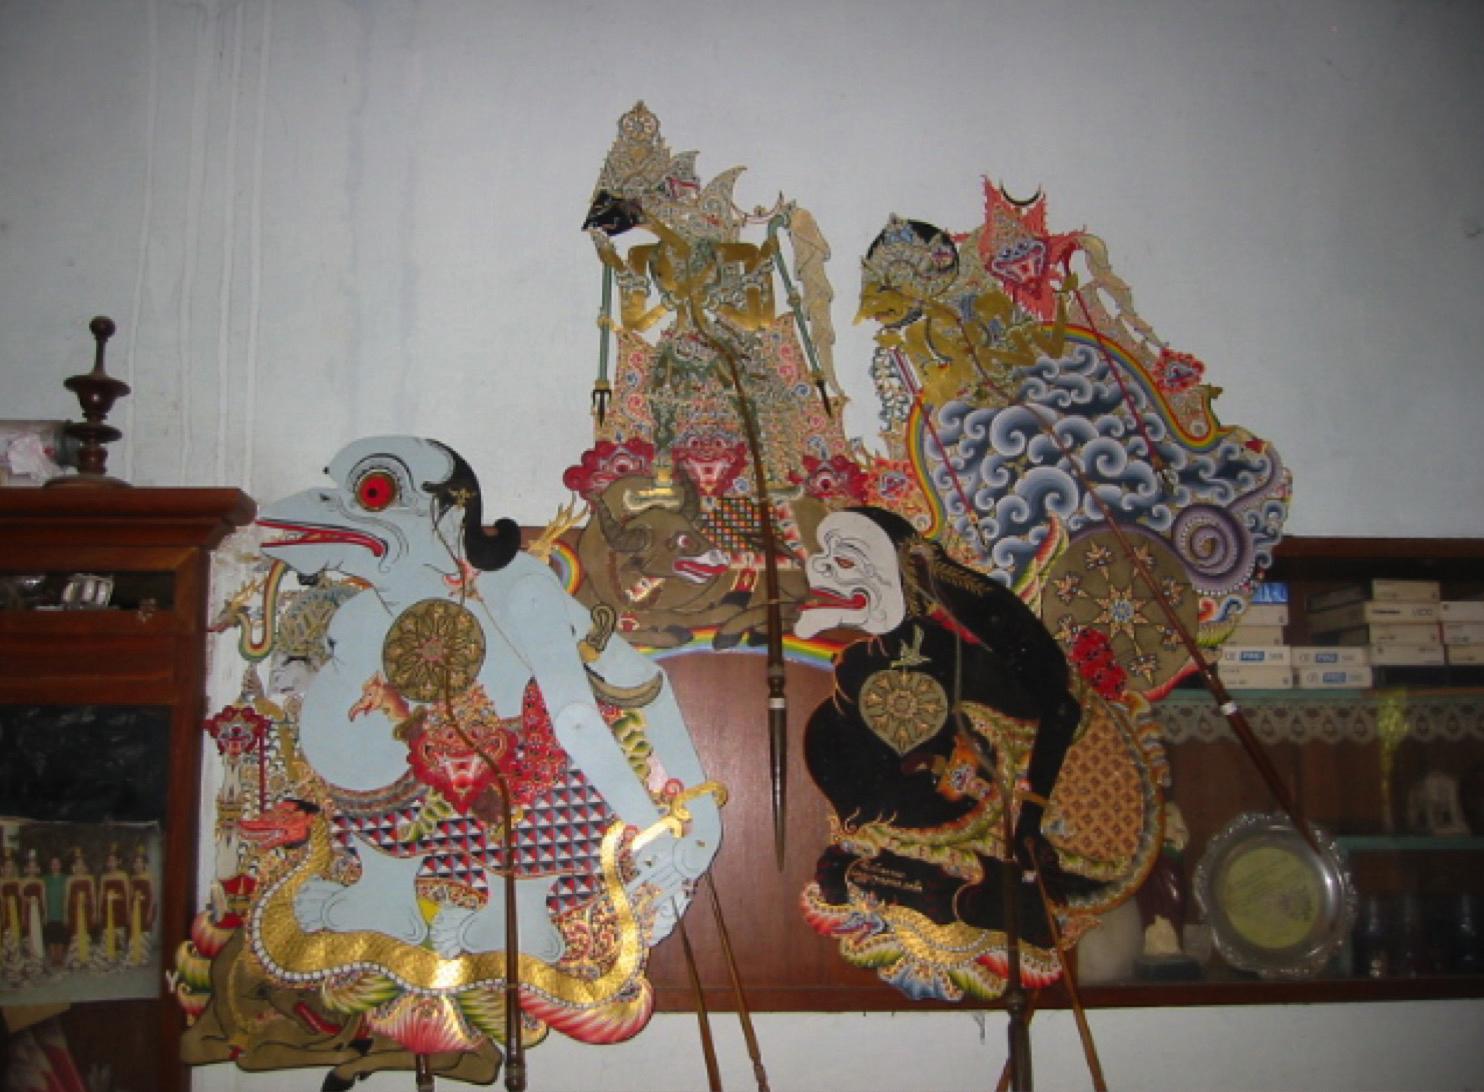 Semar (conseiller-compagnon de la « Droite ») et Togog (clown-compagnon de la  « Gauche »), avec <em>Sri</em> Kresna et <em>Bathara</em> Guru, figurines d'ombre créées par <em>Ki</em> Bambang Suwarno dans le style de Surakarta de <em><em>wayang</em> kulit purwa</em>. Photo: Karen Smith